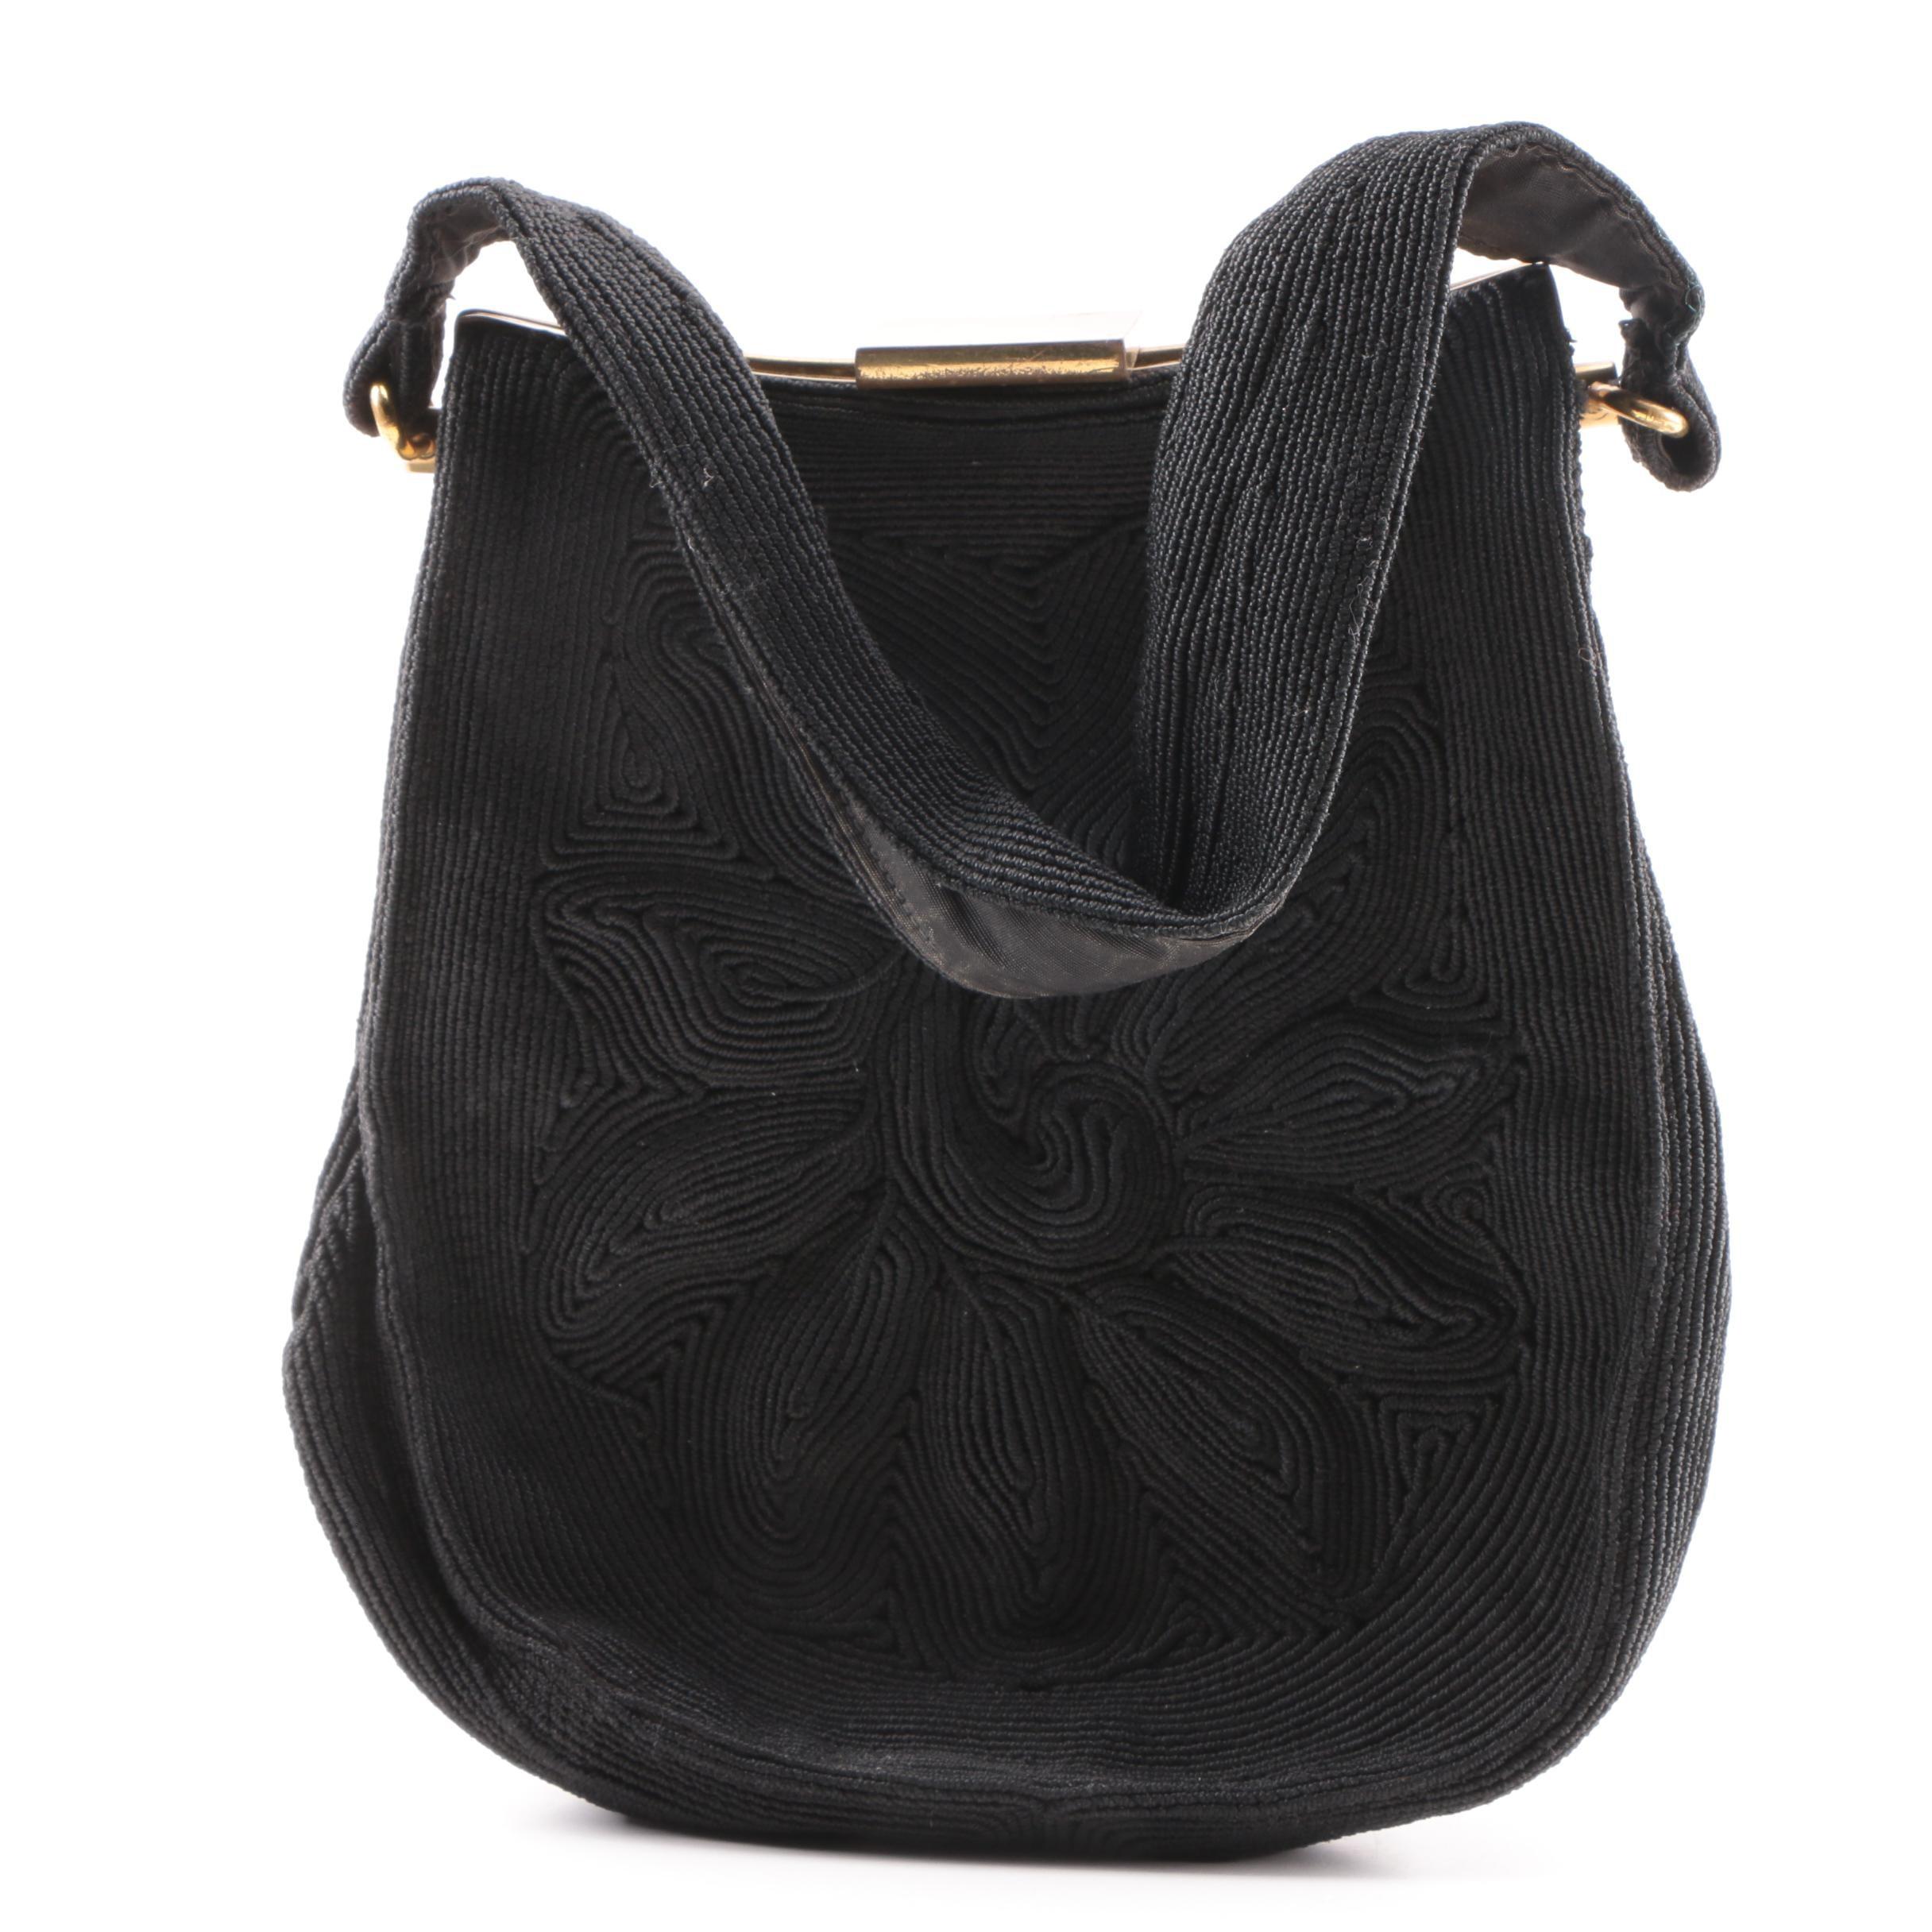 1940s Vintage Black Corde Soutache Handbag